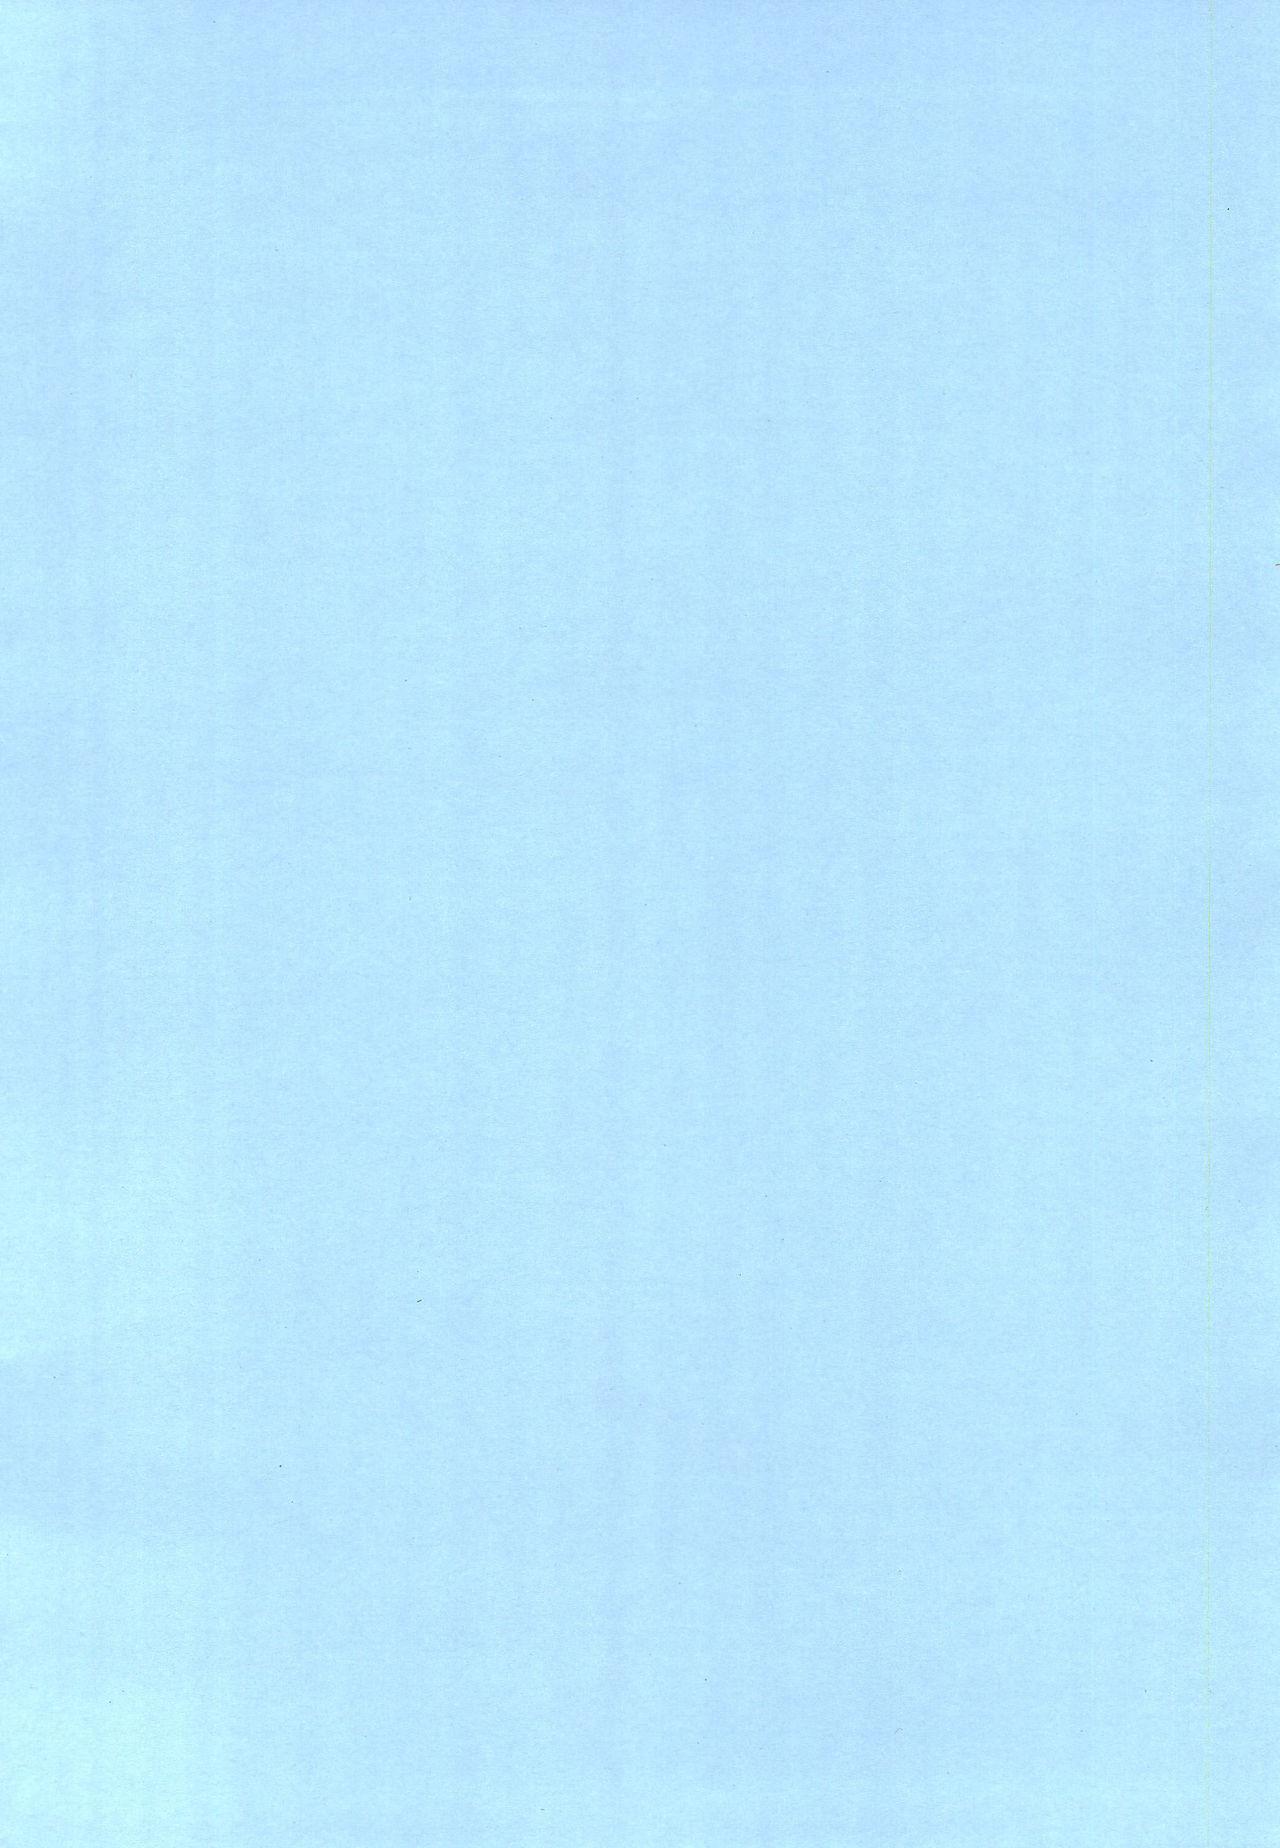 (C72) [Shamon Tei (Shamon)] KamiShimo to Ichinenjuu 2007-nen 9-gatsu - 2008-nen 8-gatsu Calendar (Gurren Lagann) 14